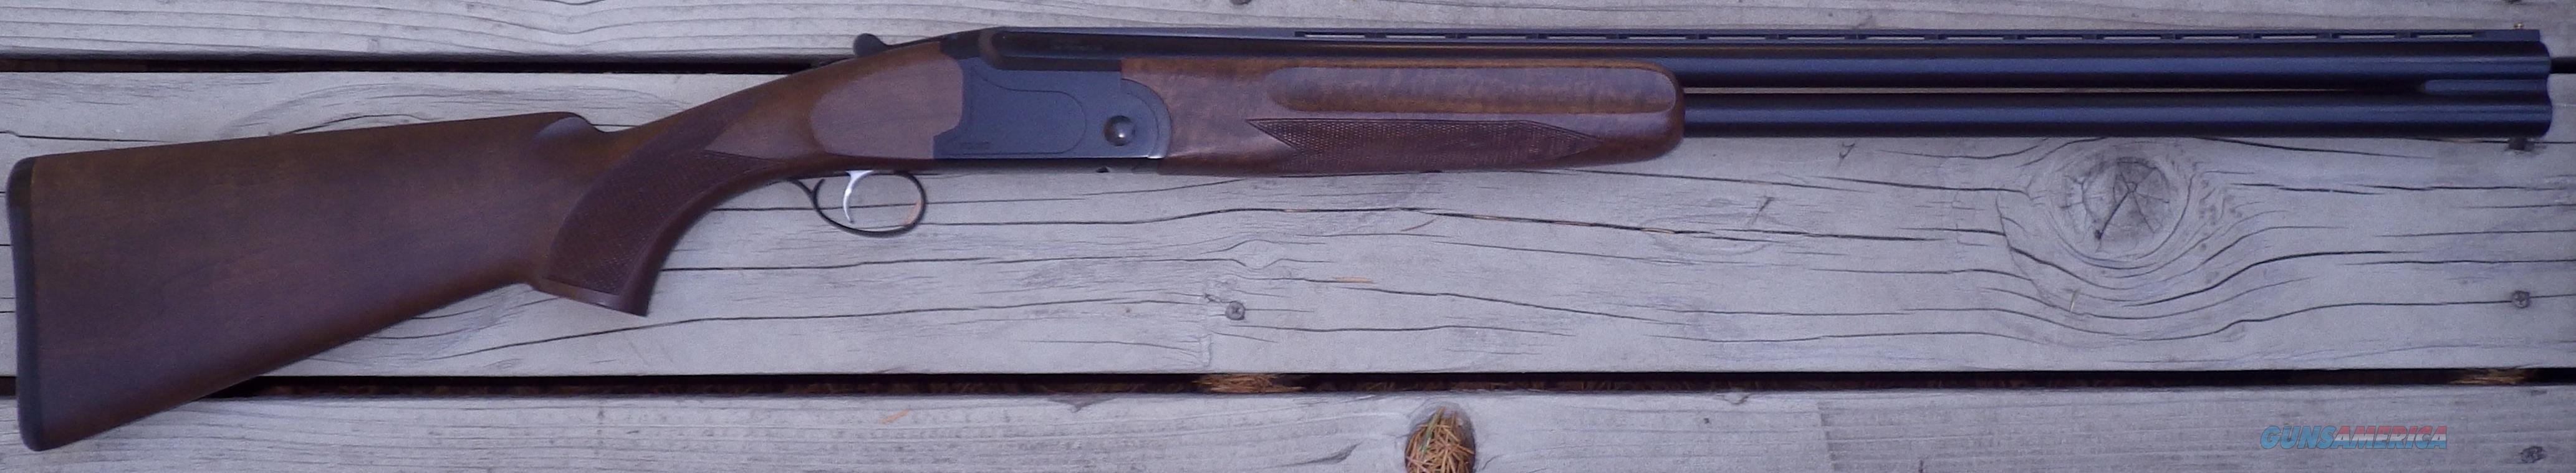 Yildiz 12 gauge O/U, 3-inch, 28-inch, 6.2 pounds, SST, unfired, IC/M tubes  Guns > Shotguns > XYZ Misc Shotguns